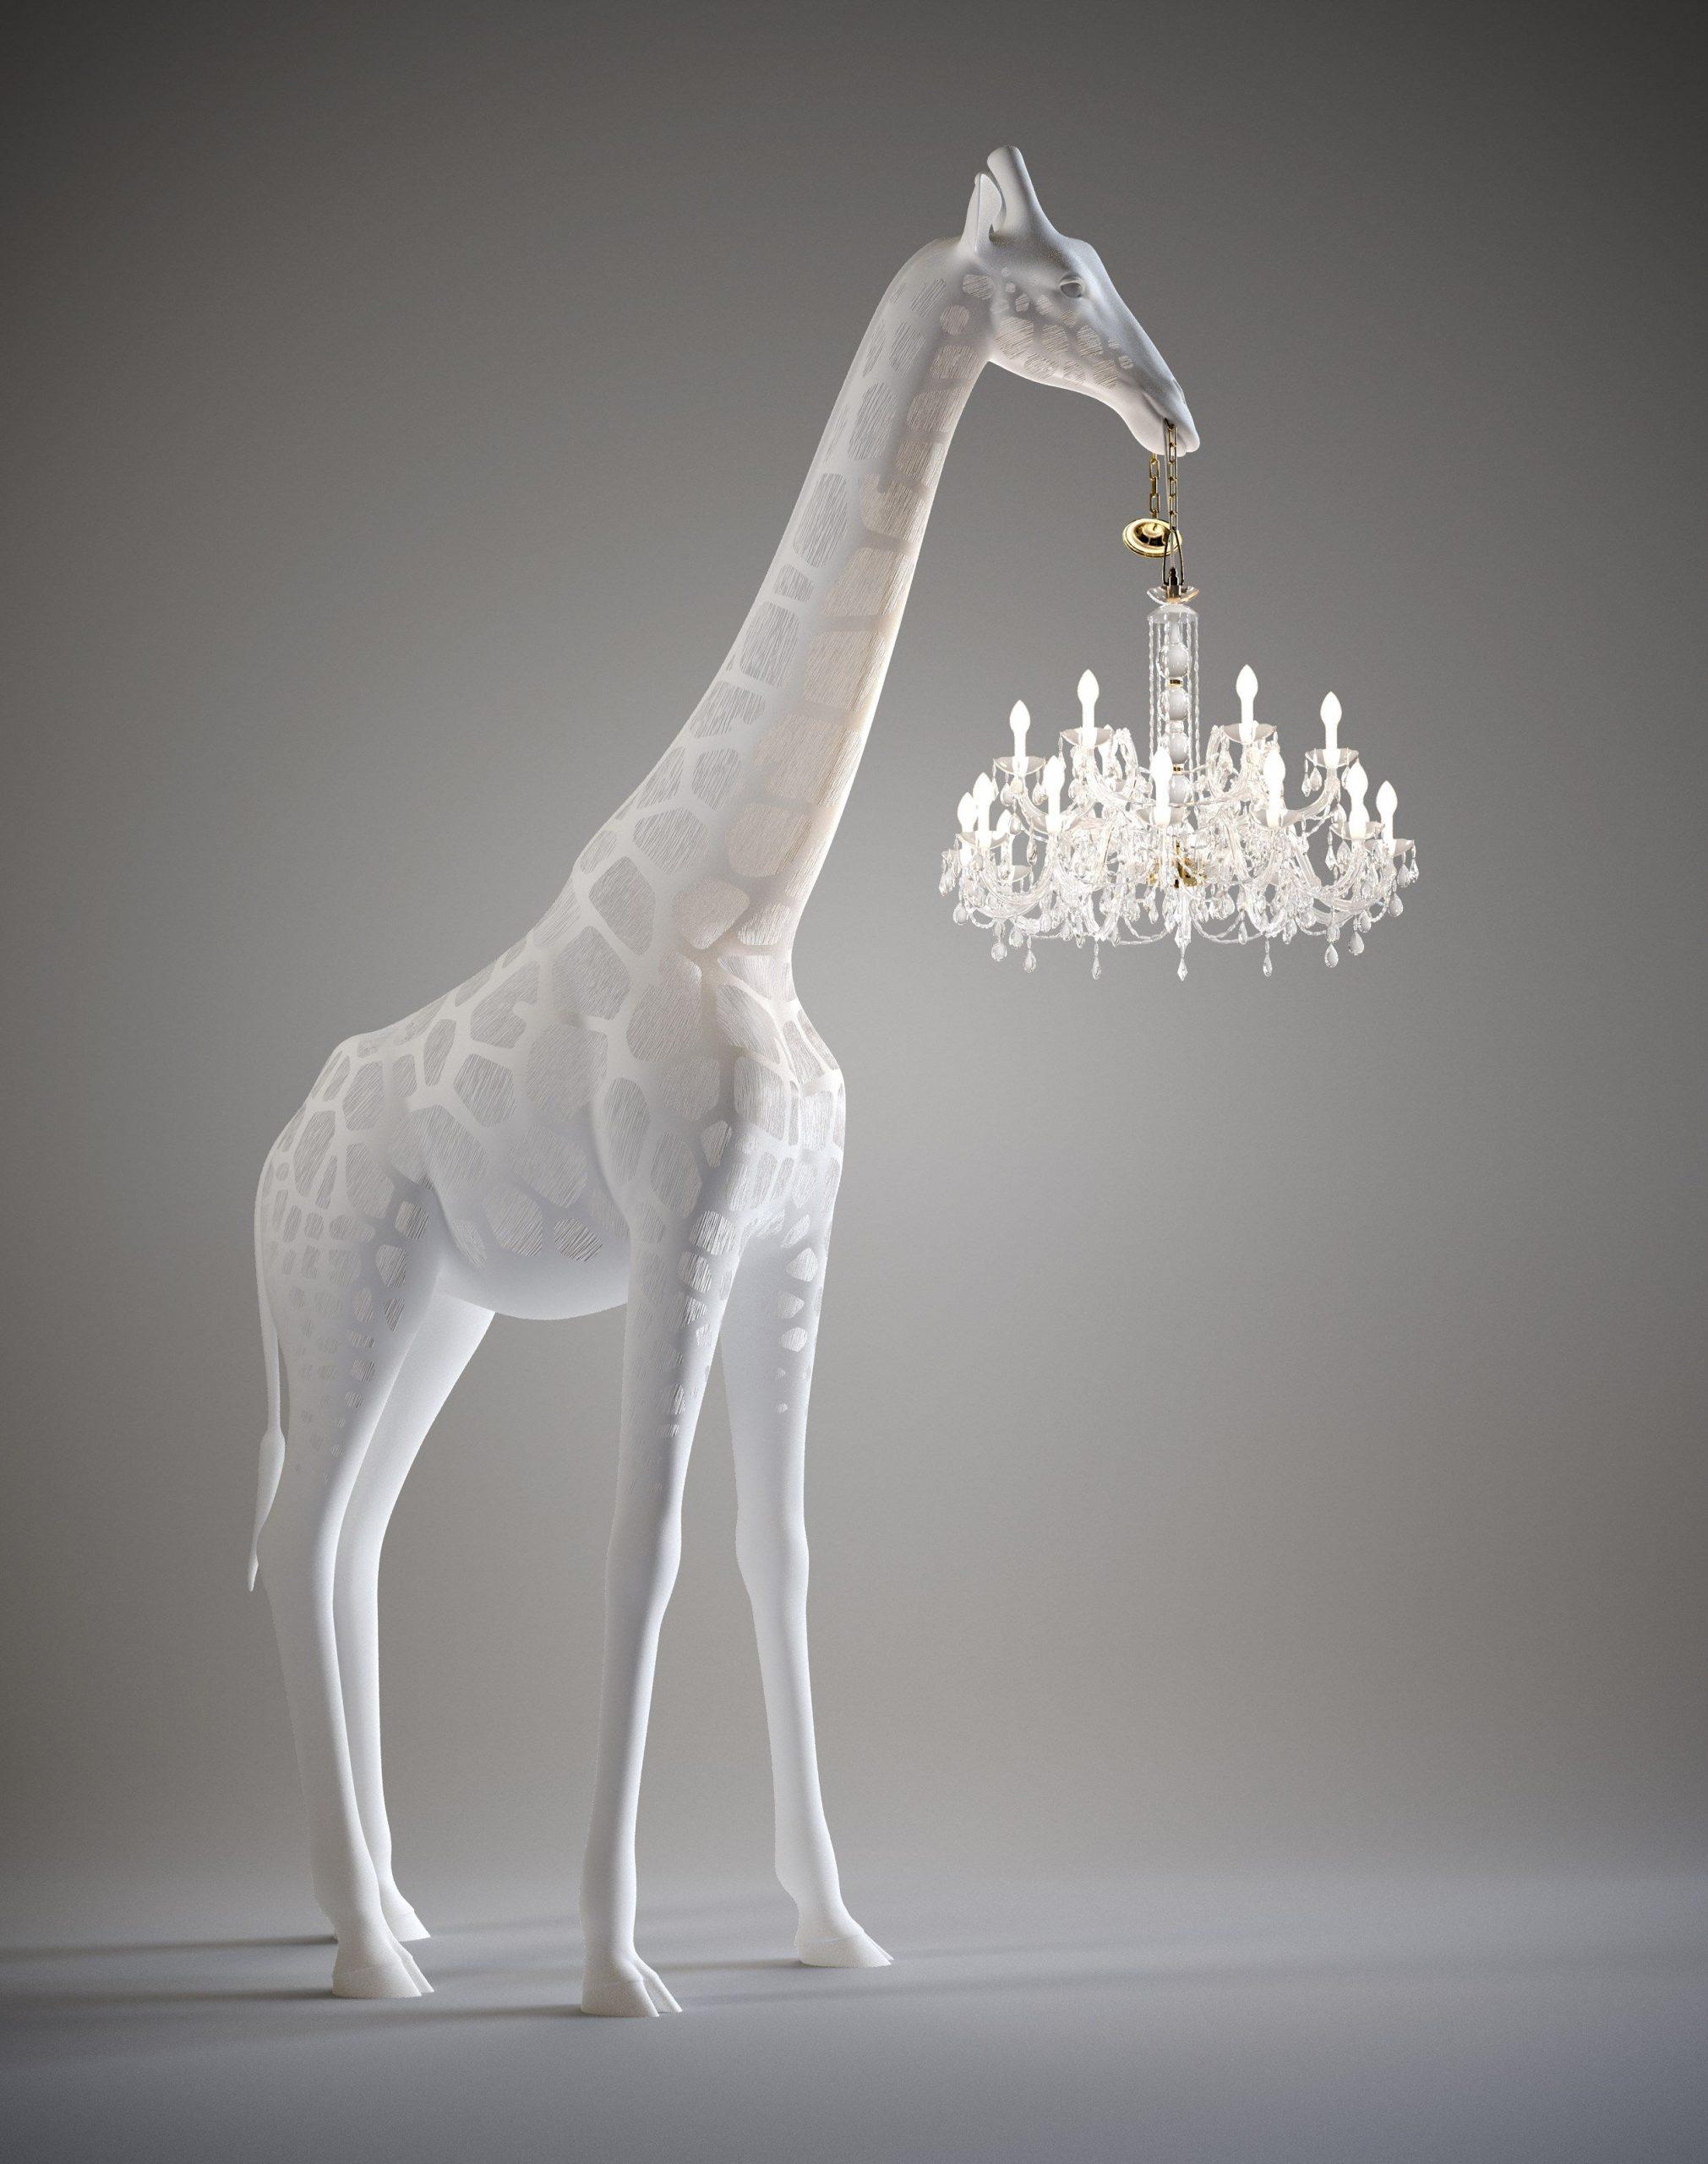 GIRAFFE IN LOVE | Floor lamp Giraffe In Love Collection By Qeeboo design Marcantonio Raimondi Malerba